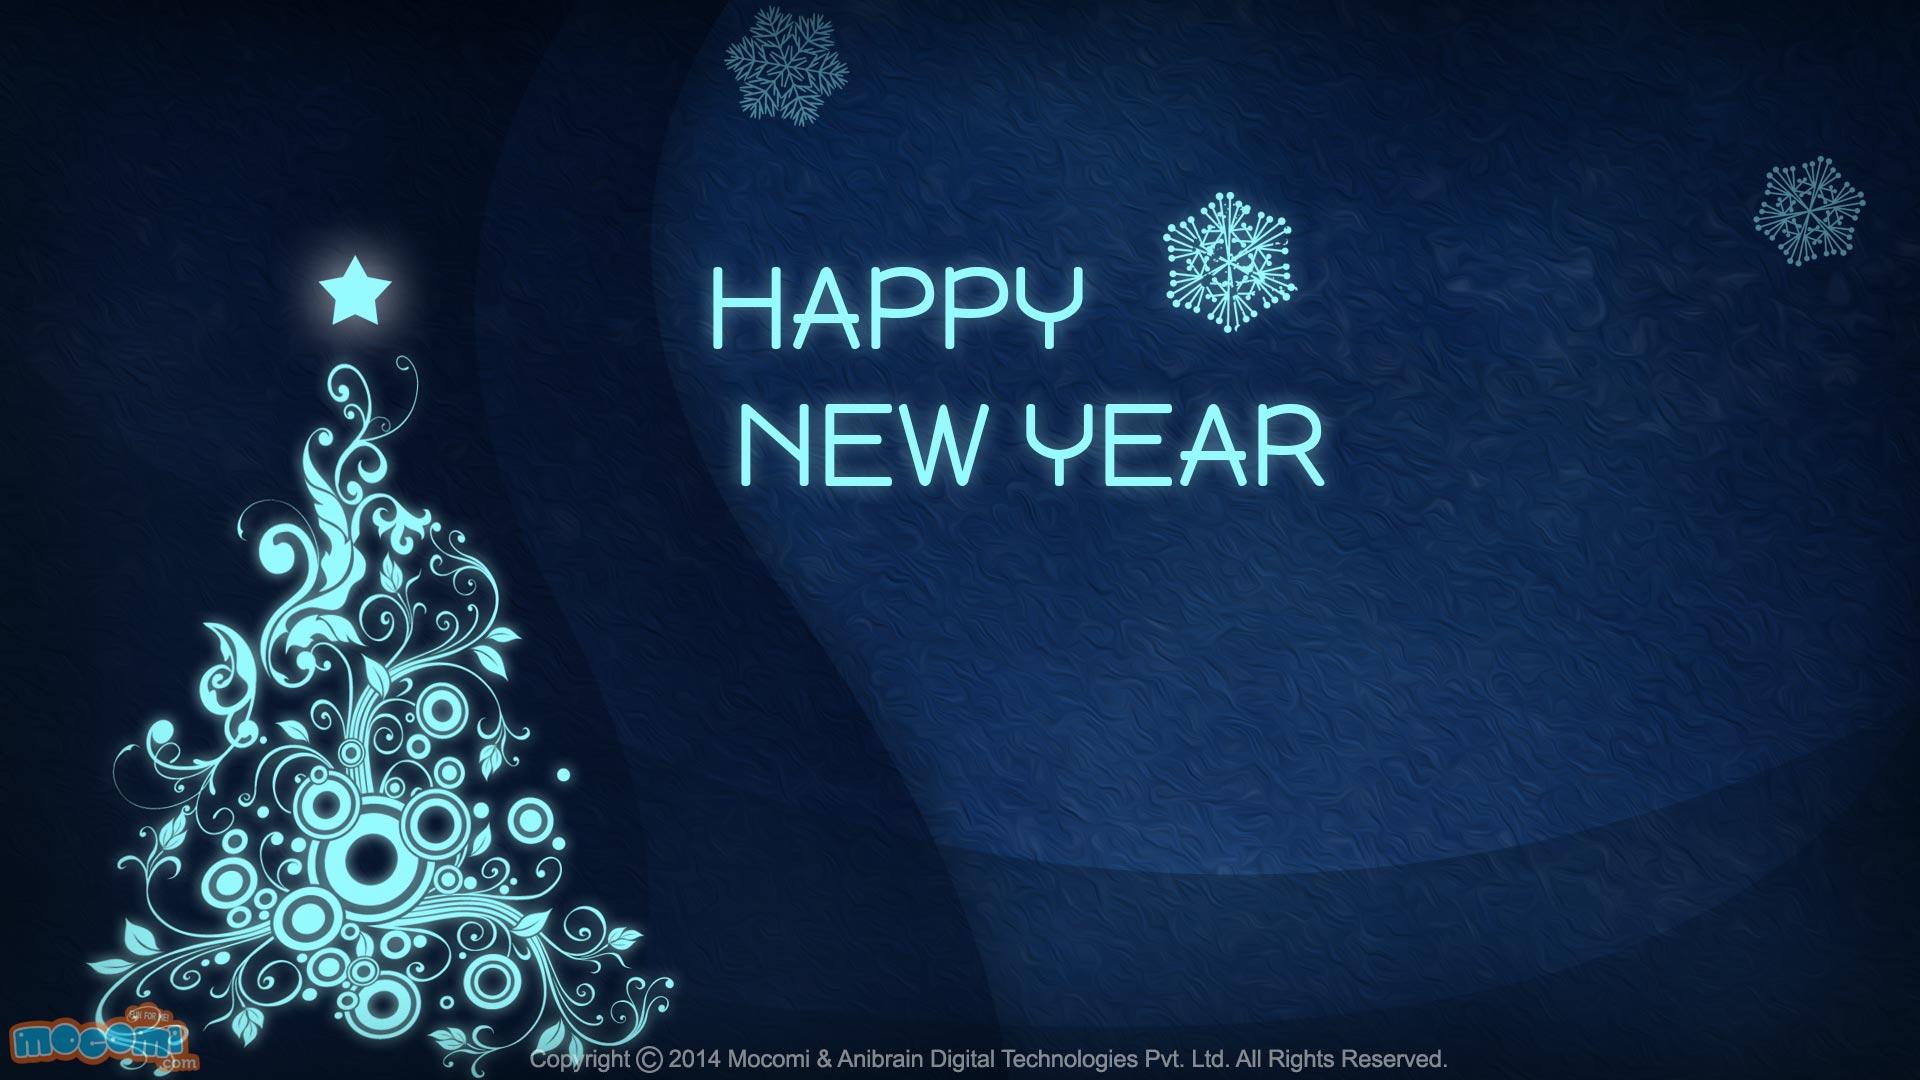 Happy New Year Wallpaper- 3